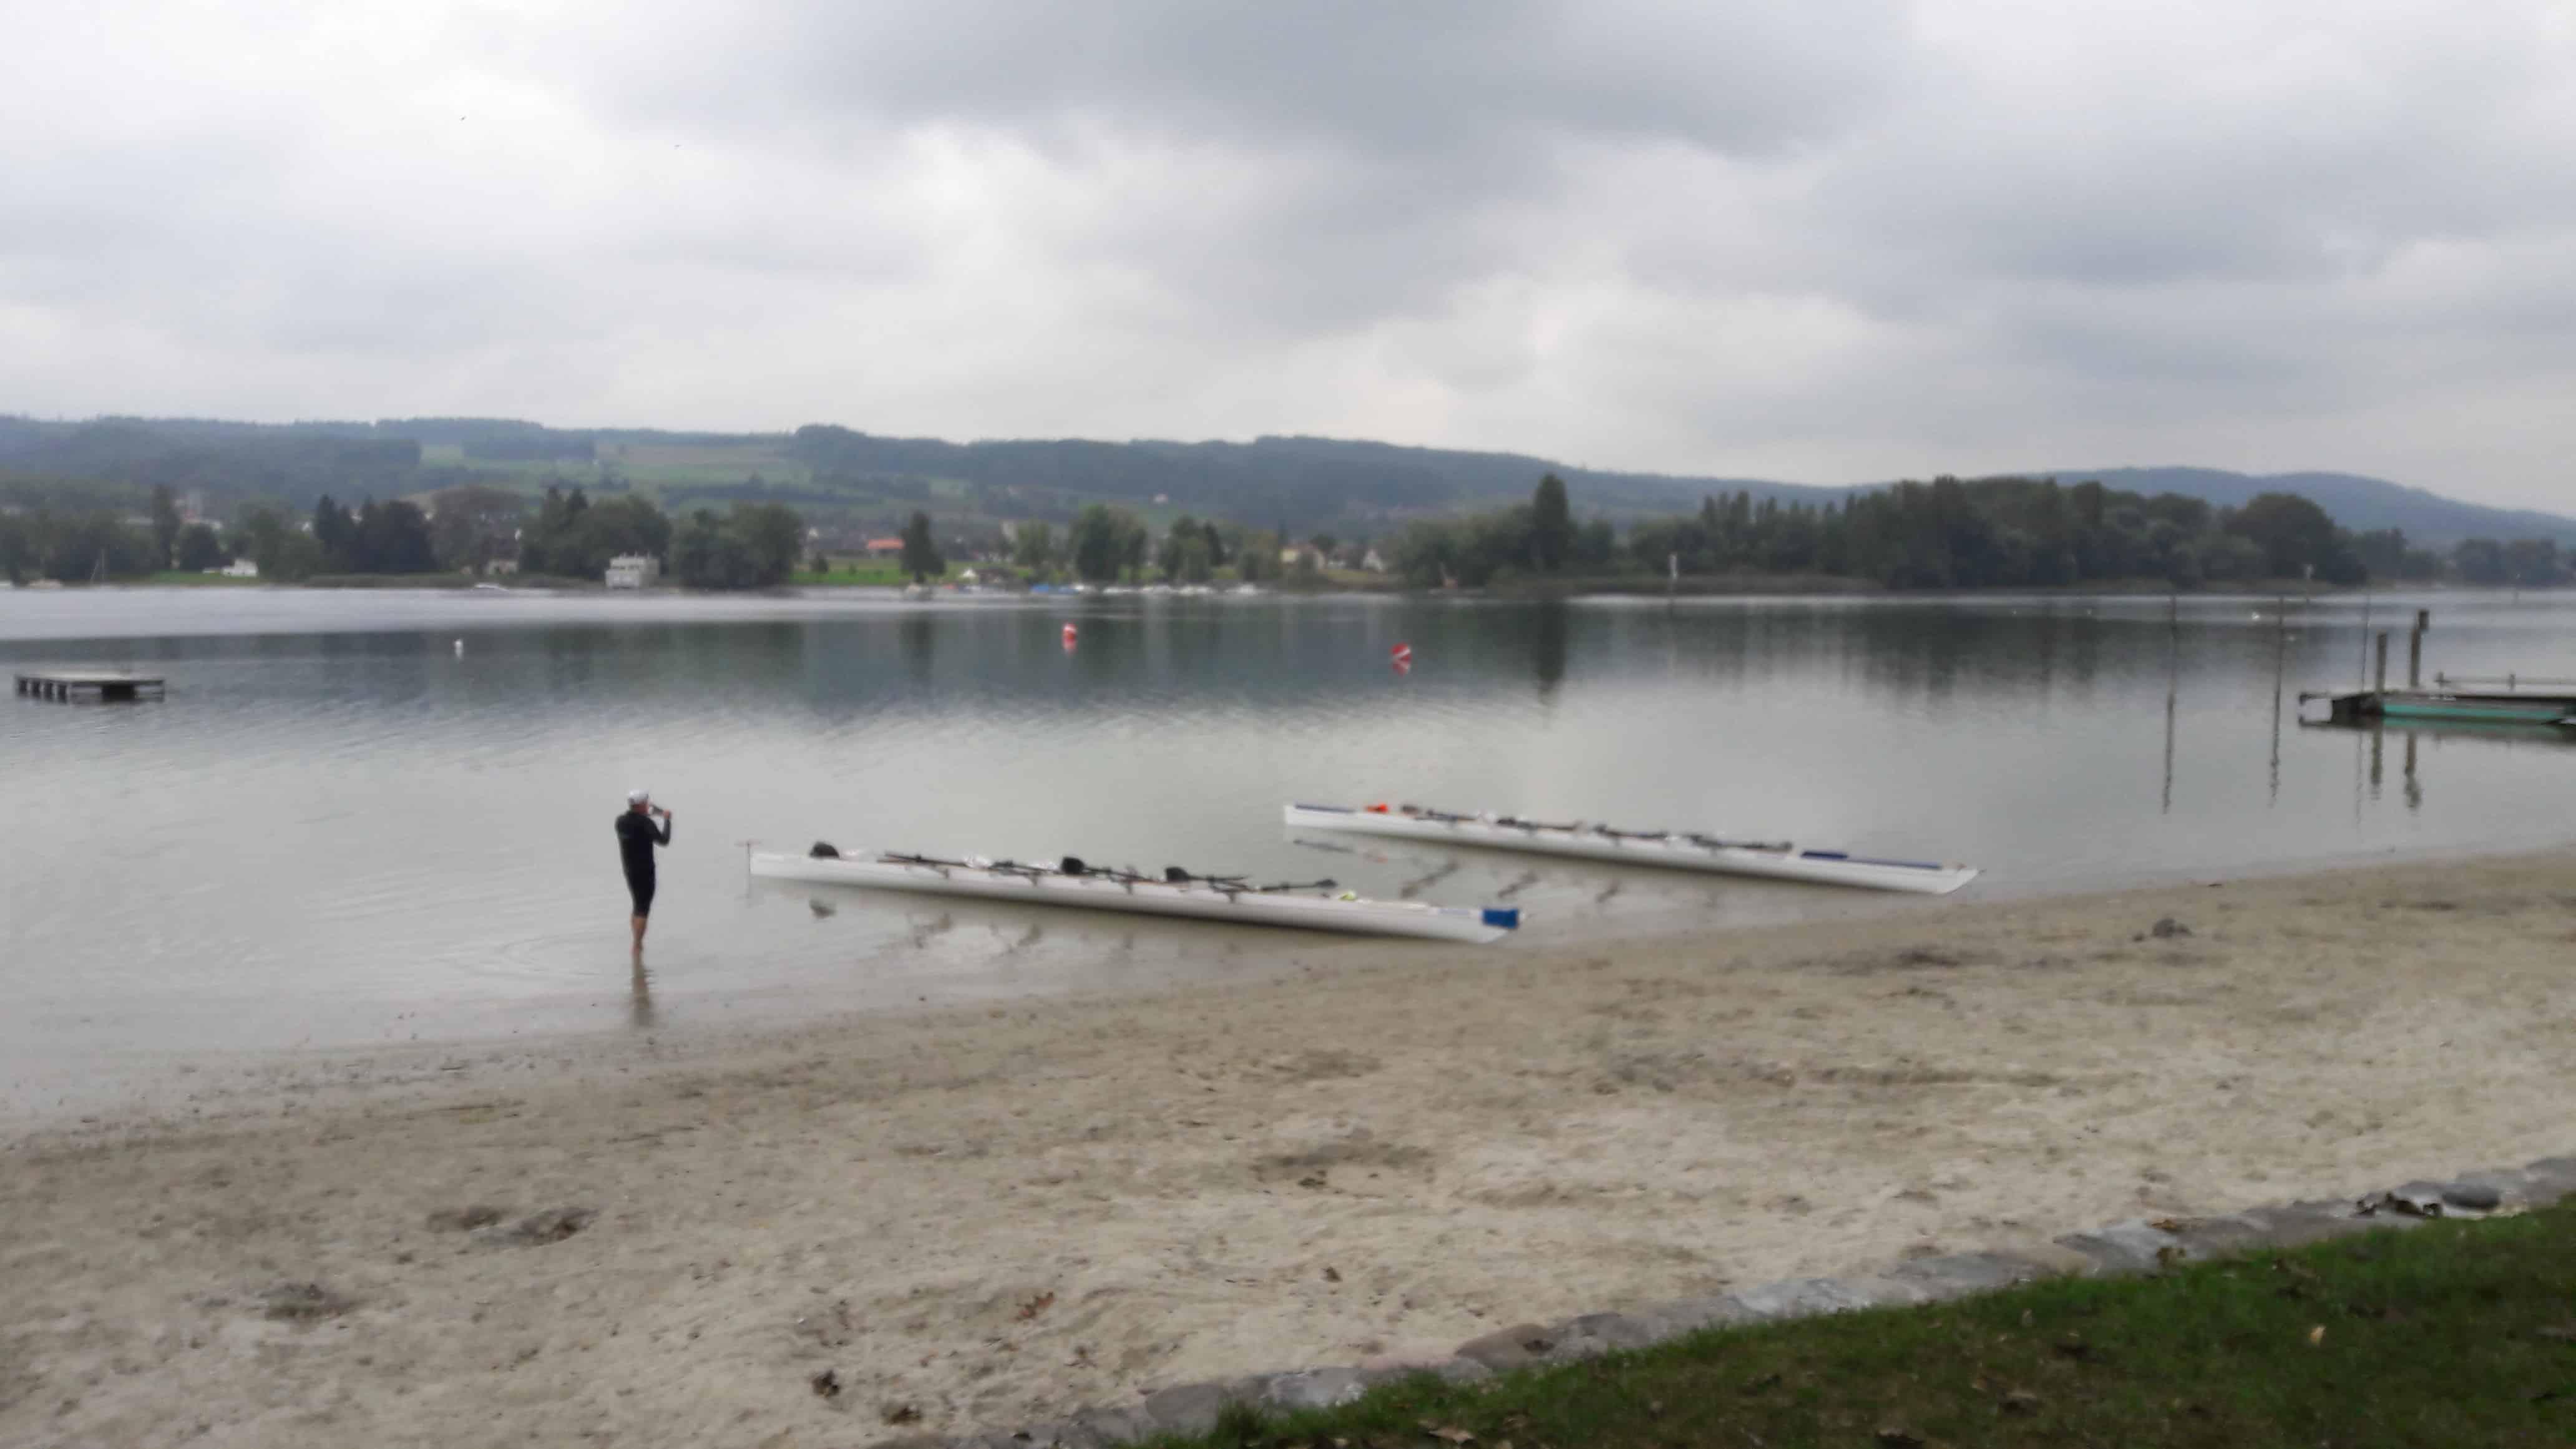 Kurze Pause in Öhningen